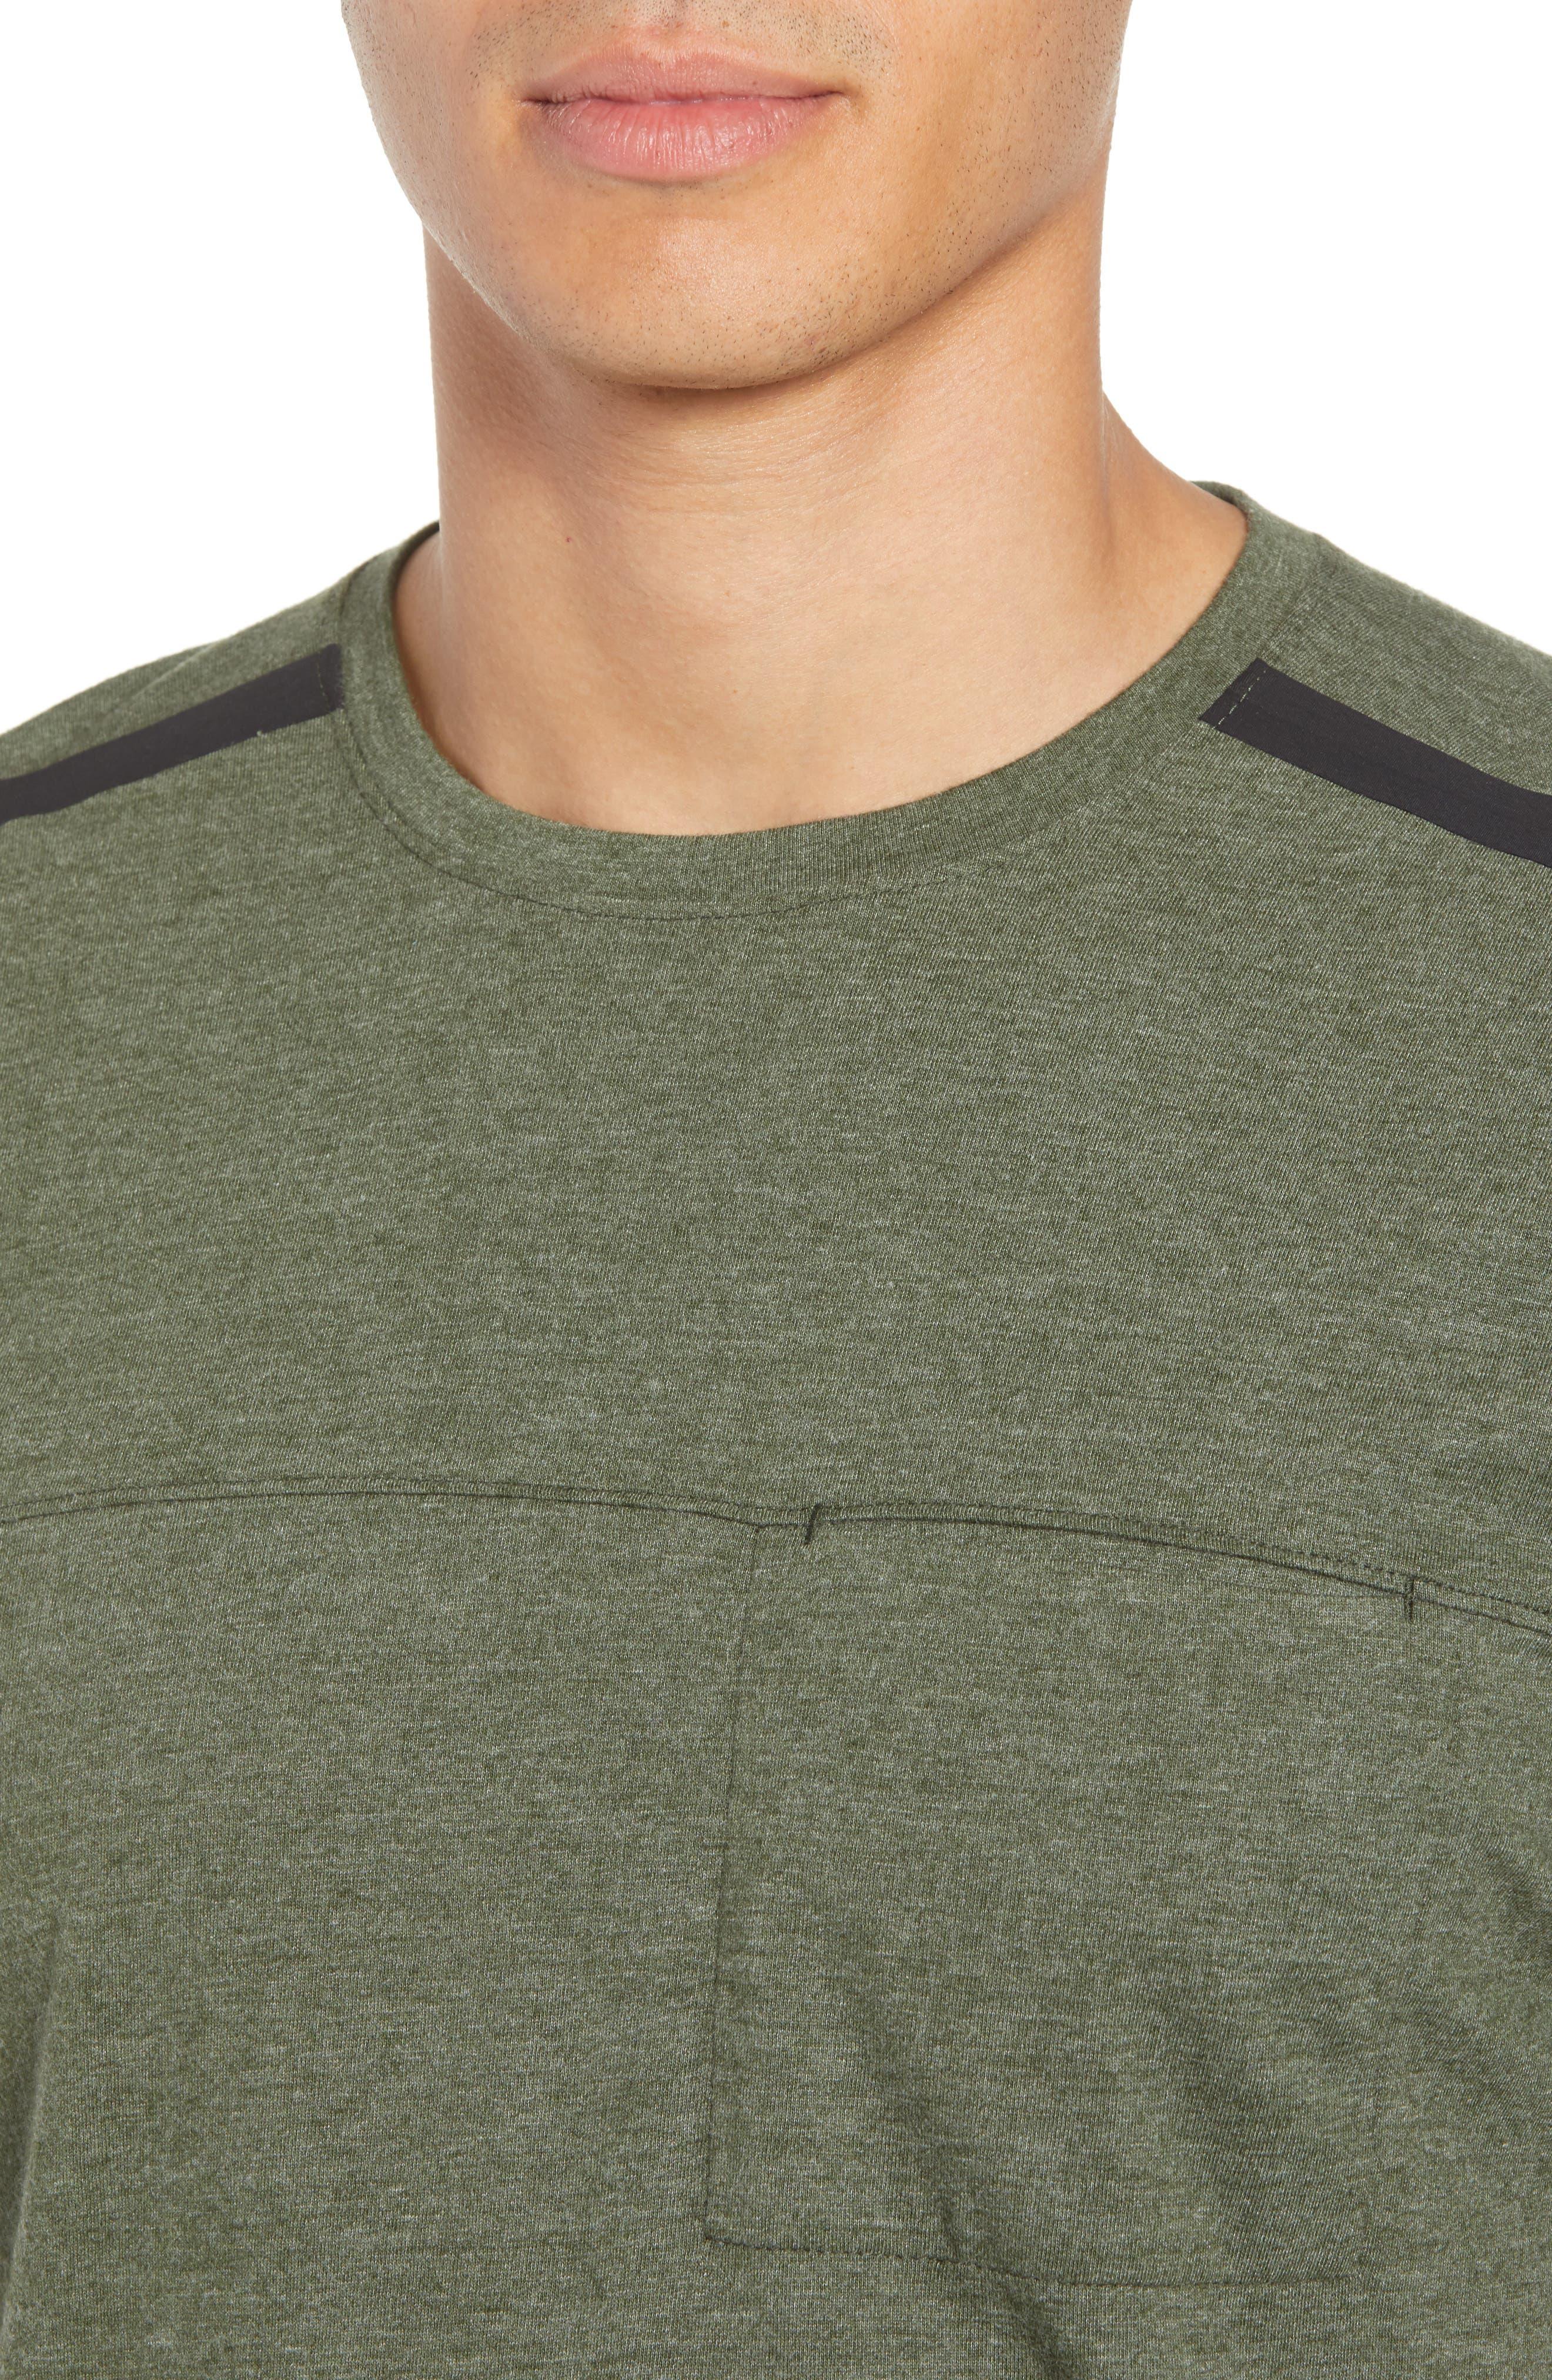 Perfomance T-Shirt,                             Alternate thumbnail 4, color,                             GREEN TACTICAL MELANGE